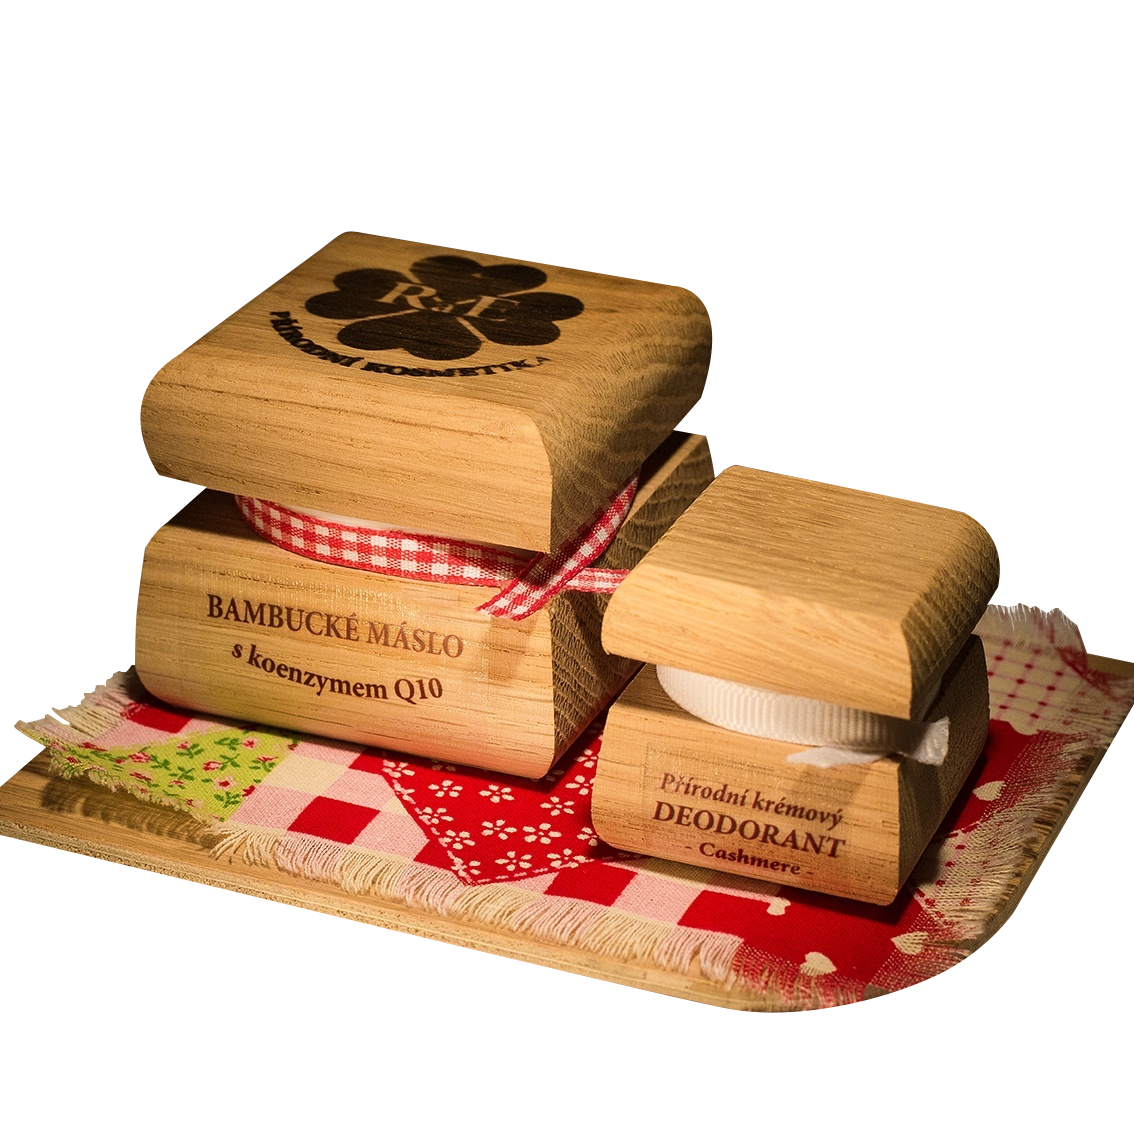 Bambucké tělové máslo Q10 + Krémový deodorant Nature - Cashmere